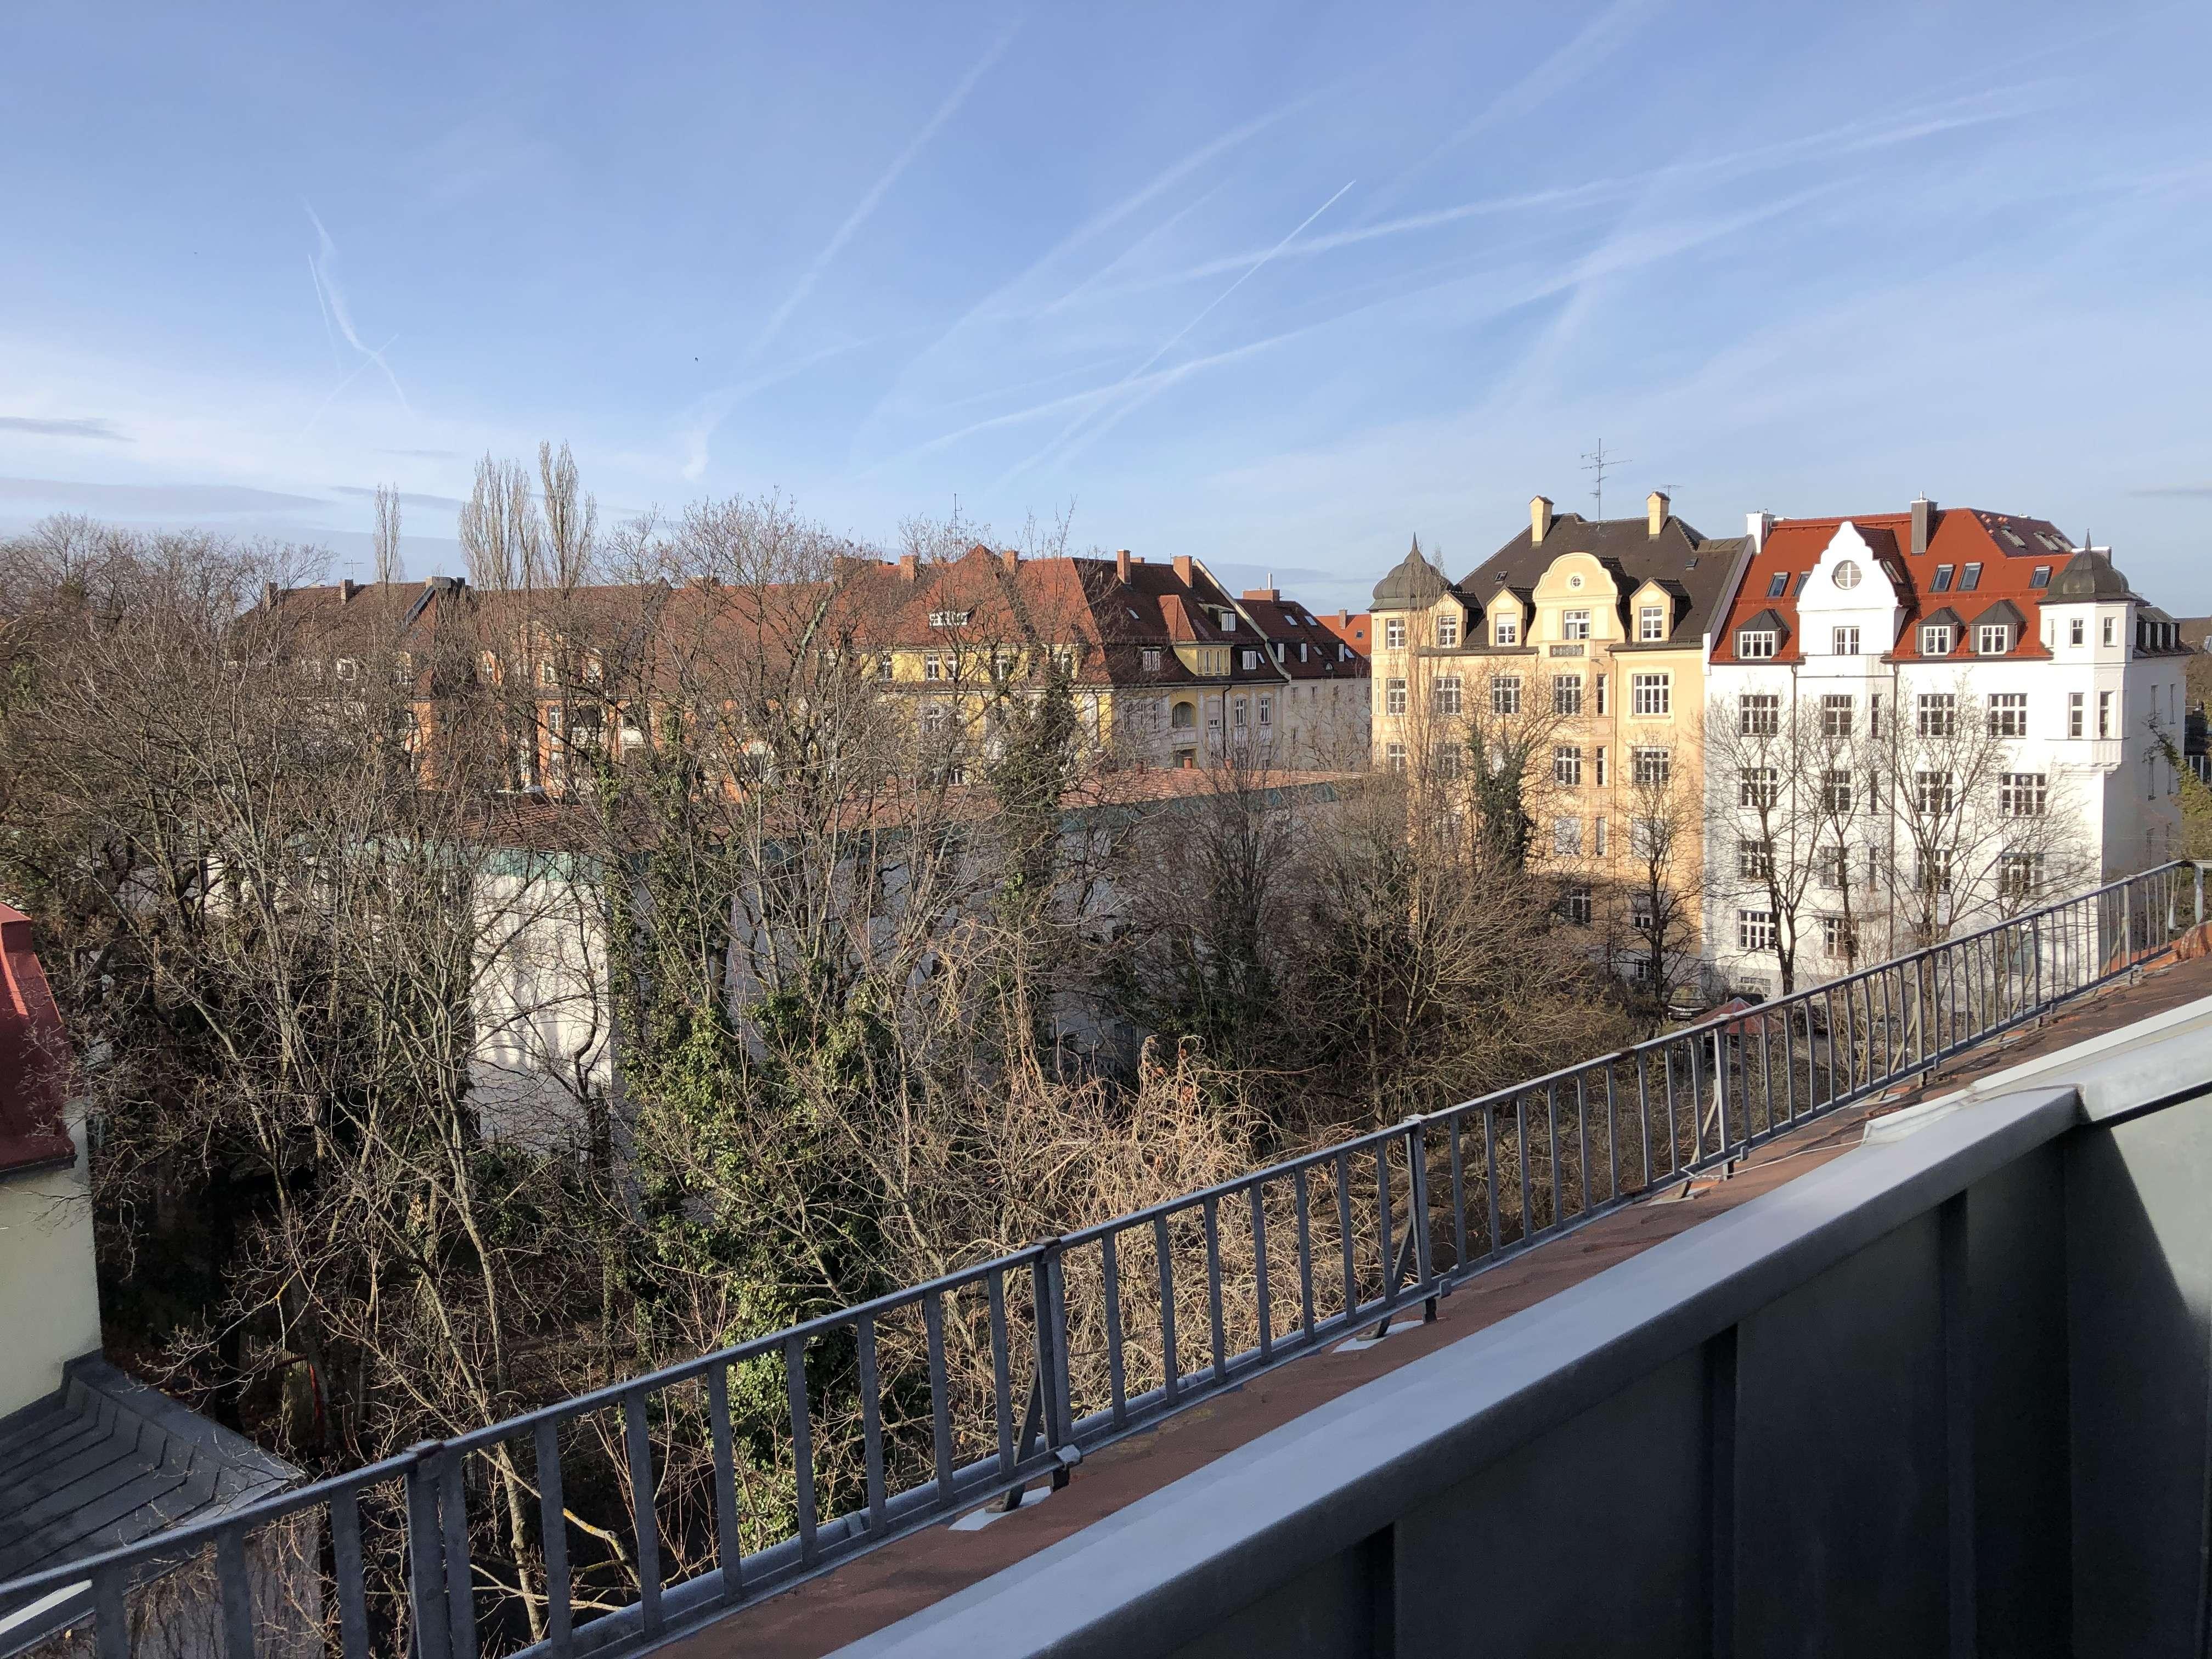 Möbliert: 2,5 Zimmer Top-Wohnung in Top-Lage Schwabing in